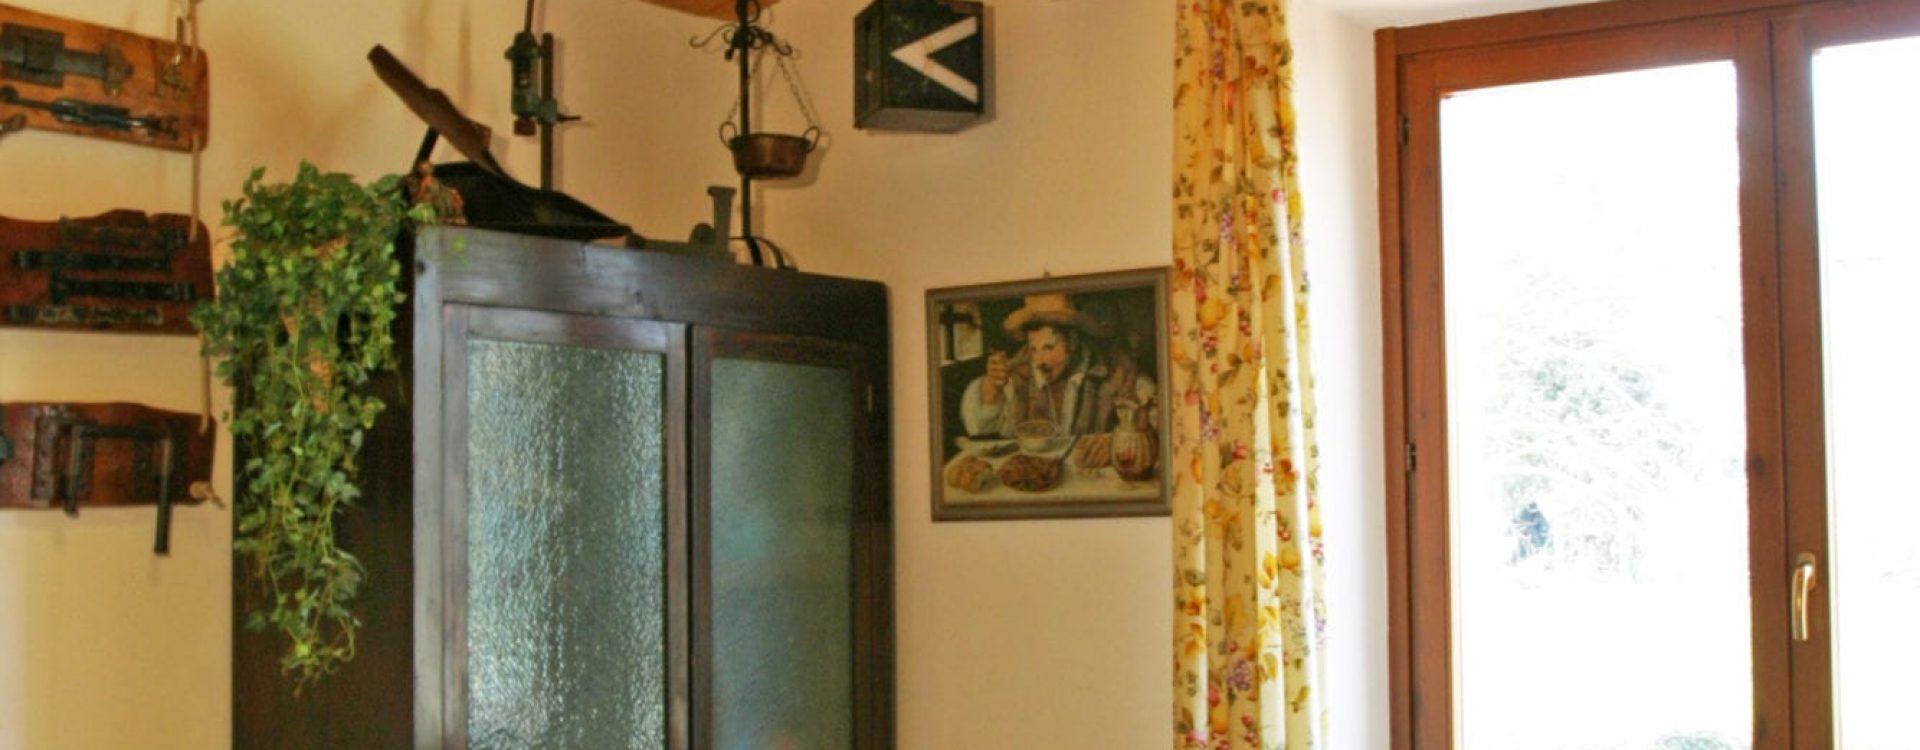 5 - cucina-angolo lampade 2